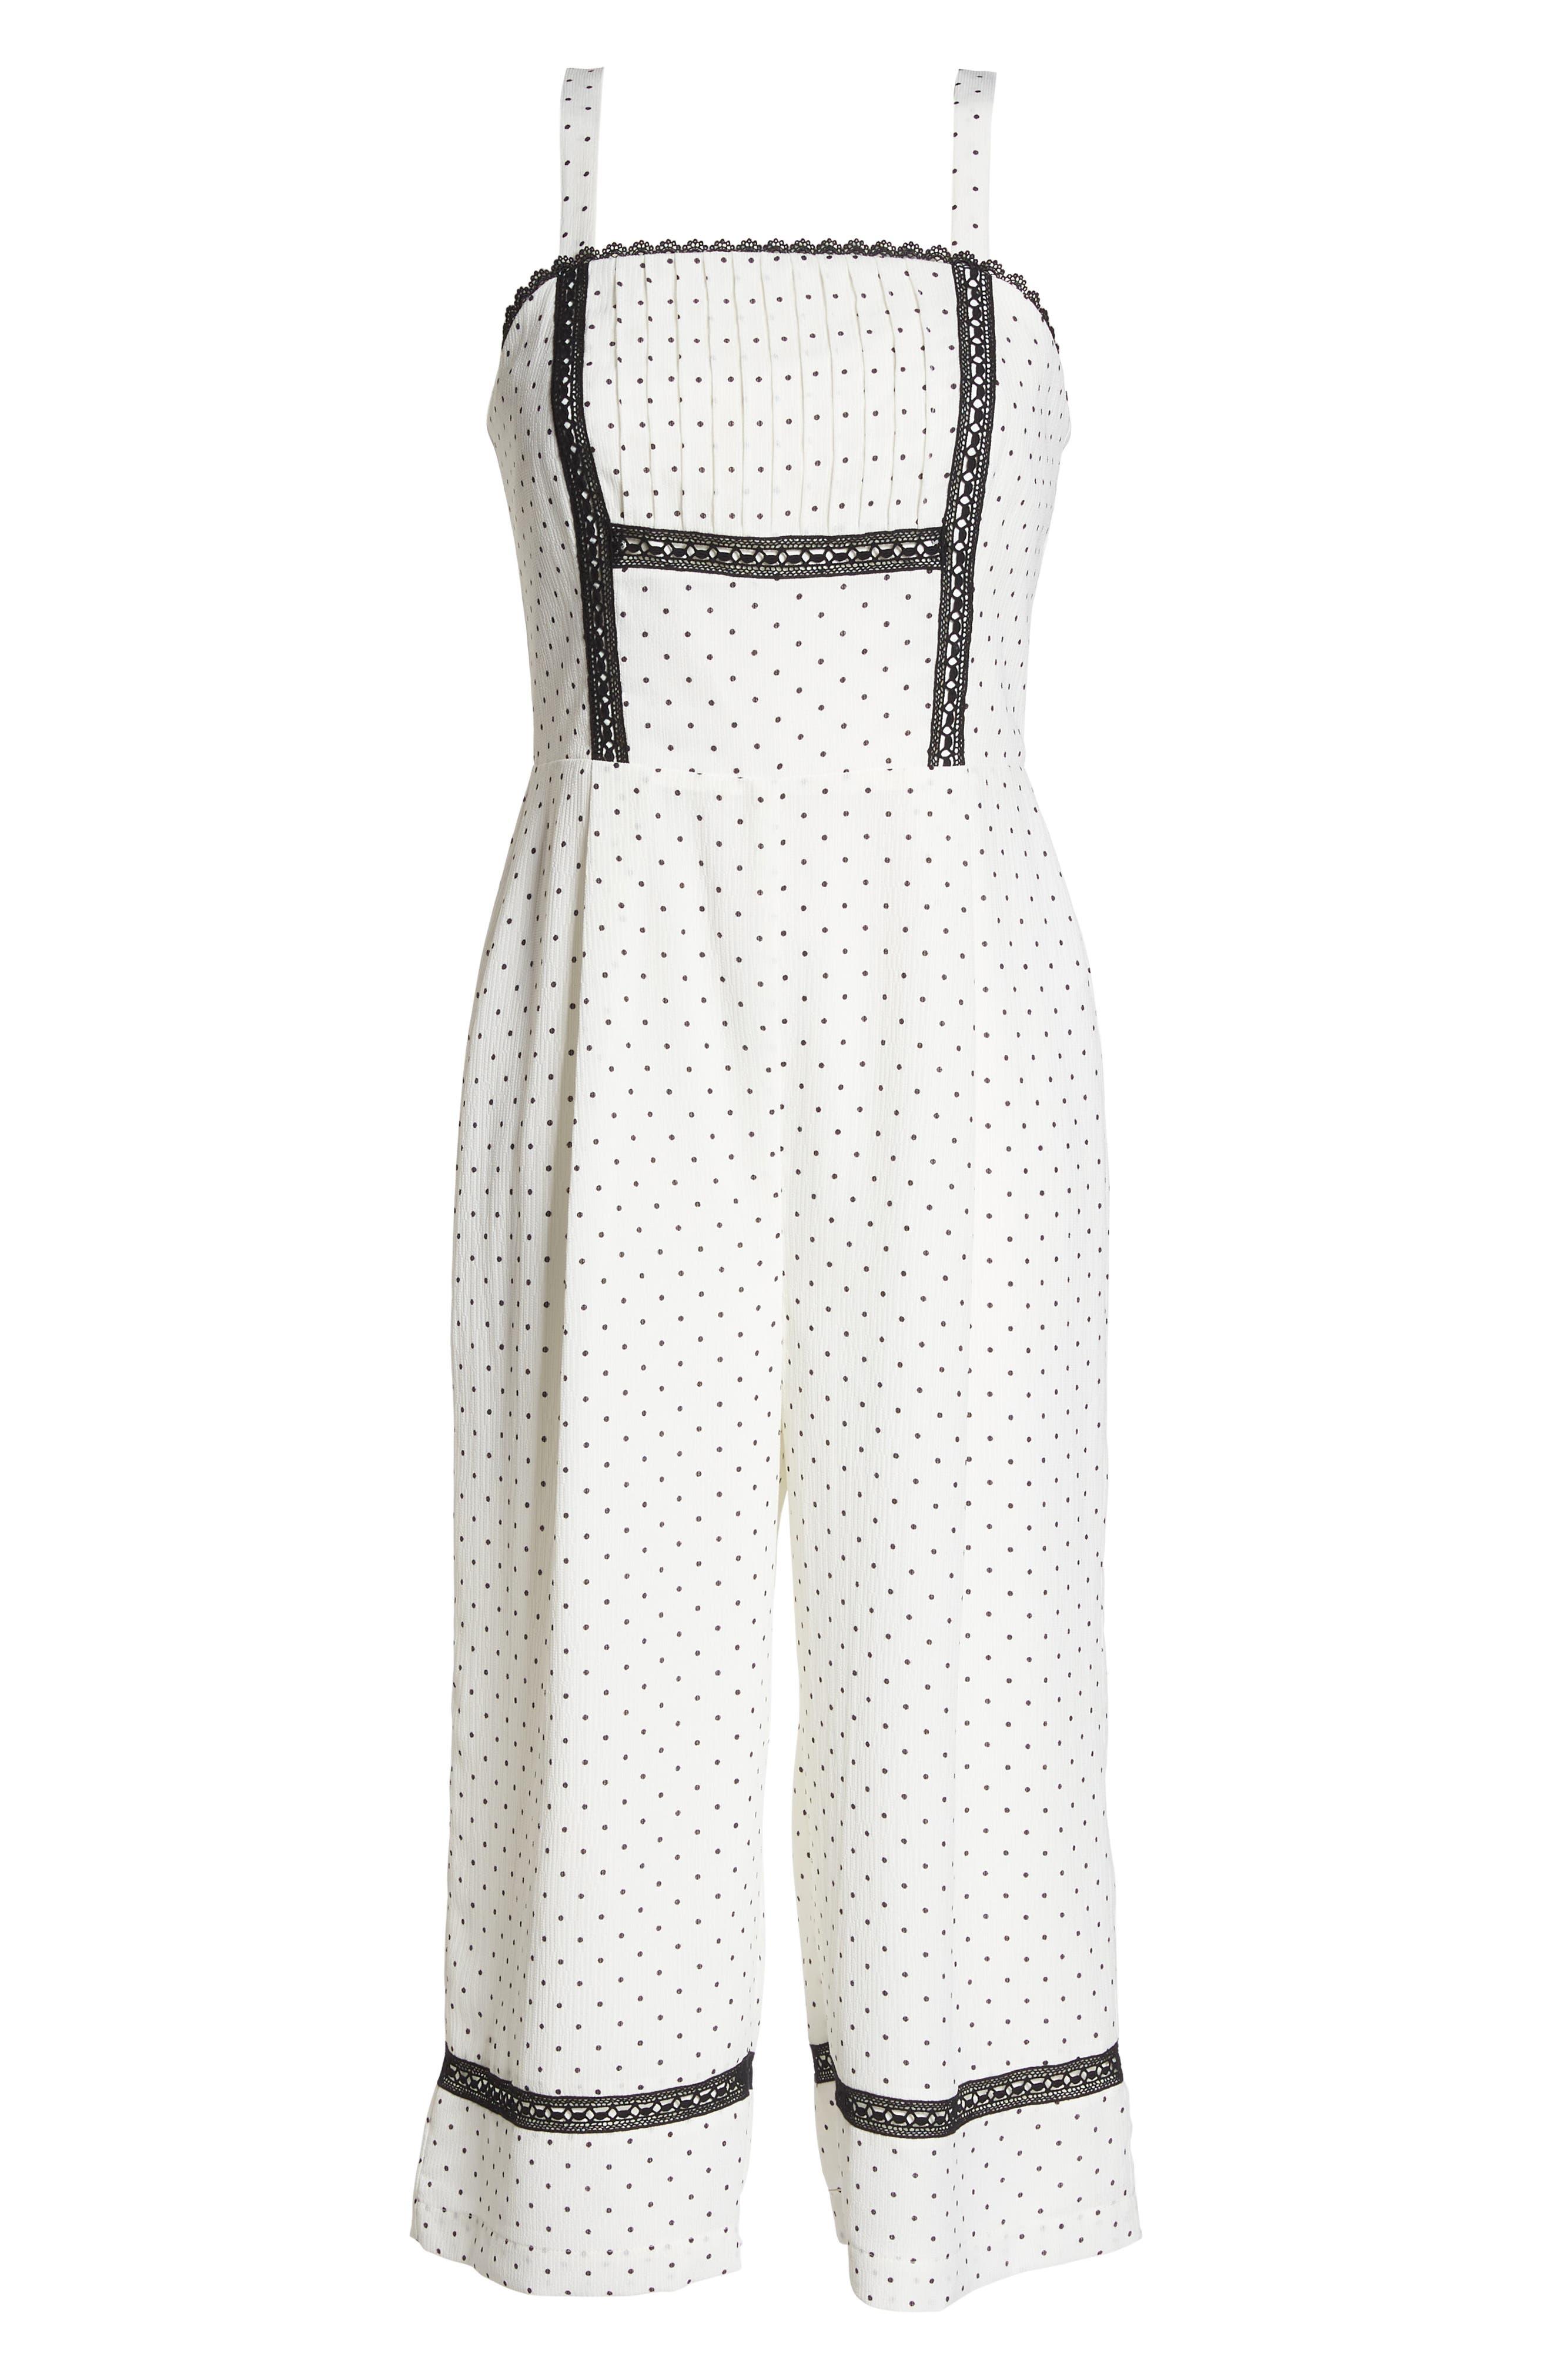 Nadine Polka Dot Culotte Jumpsuit,                             Alternate thumbnail 6, color,                             White/ Black